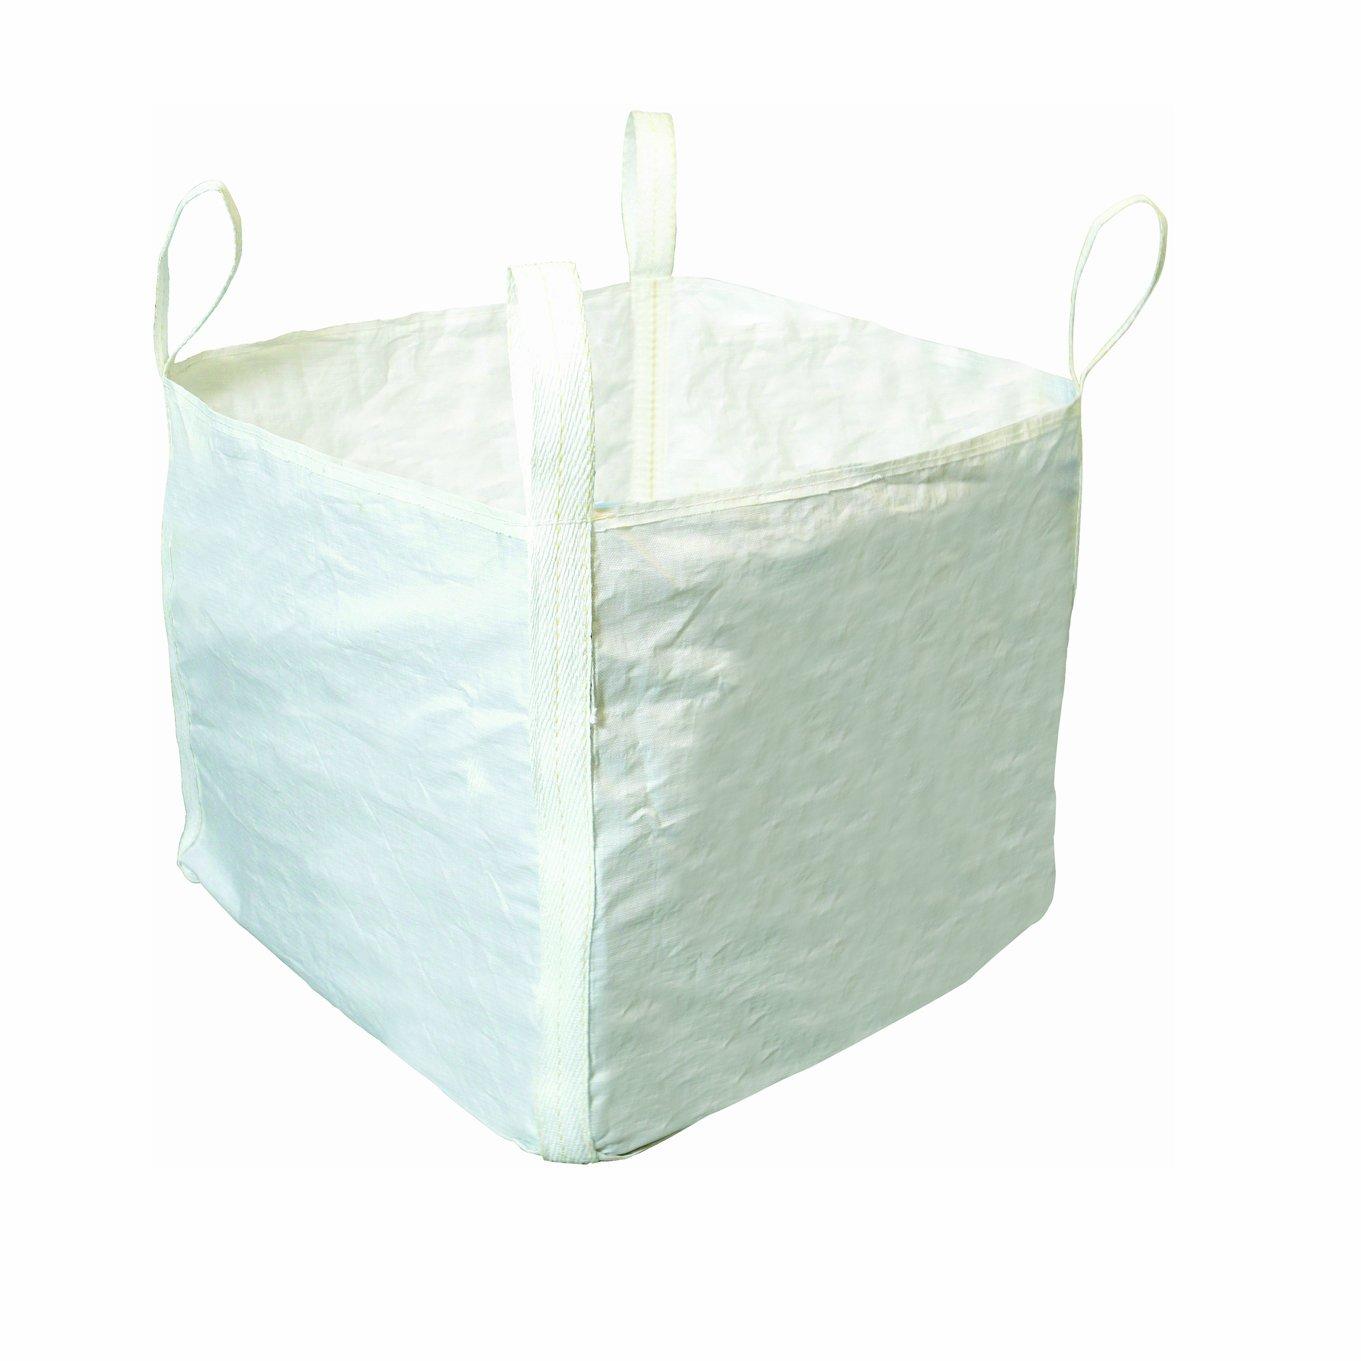 Silverline 675274 Multi-trip Bulk Bag, 1 Tonne, 900 x 900 x 900mm